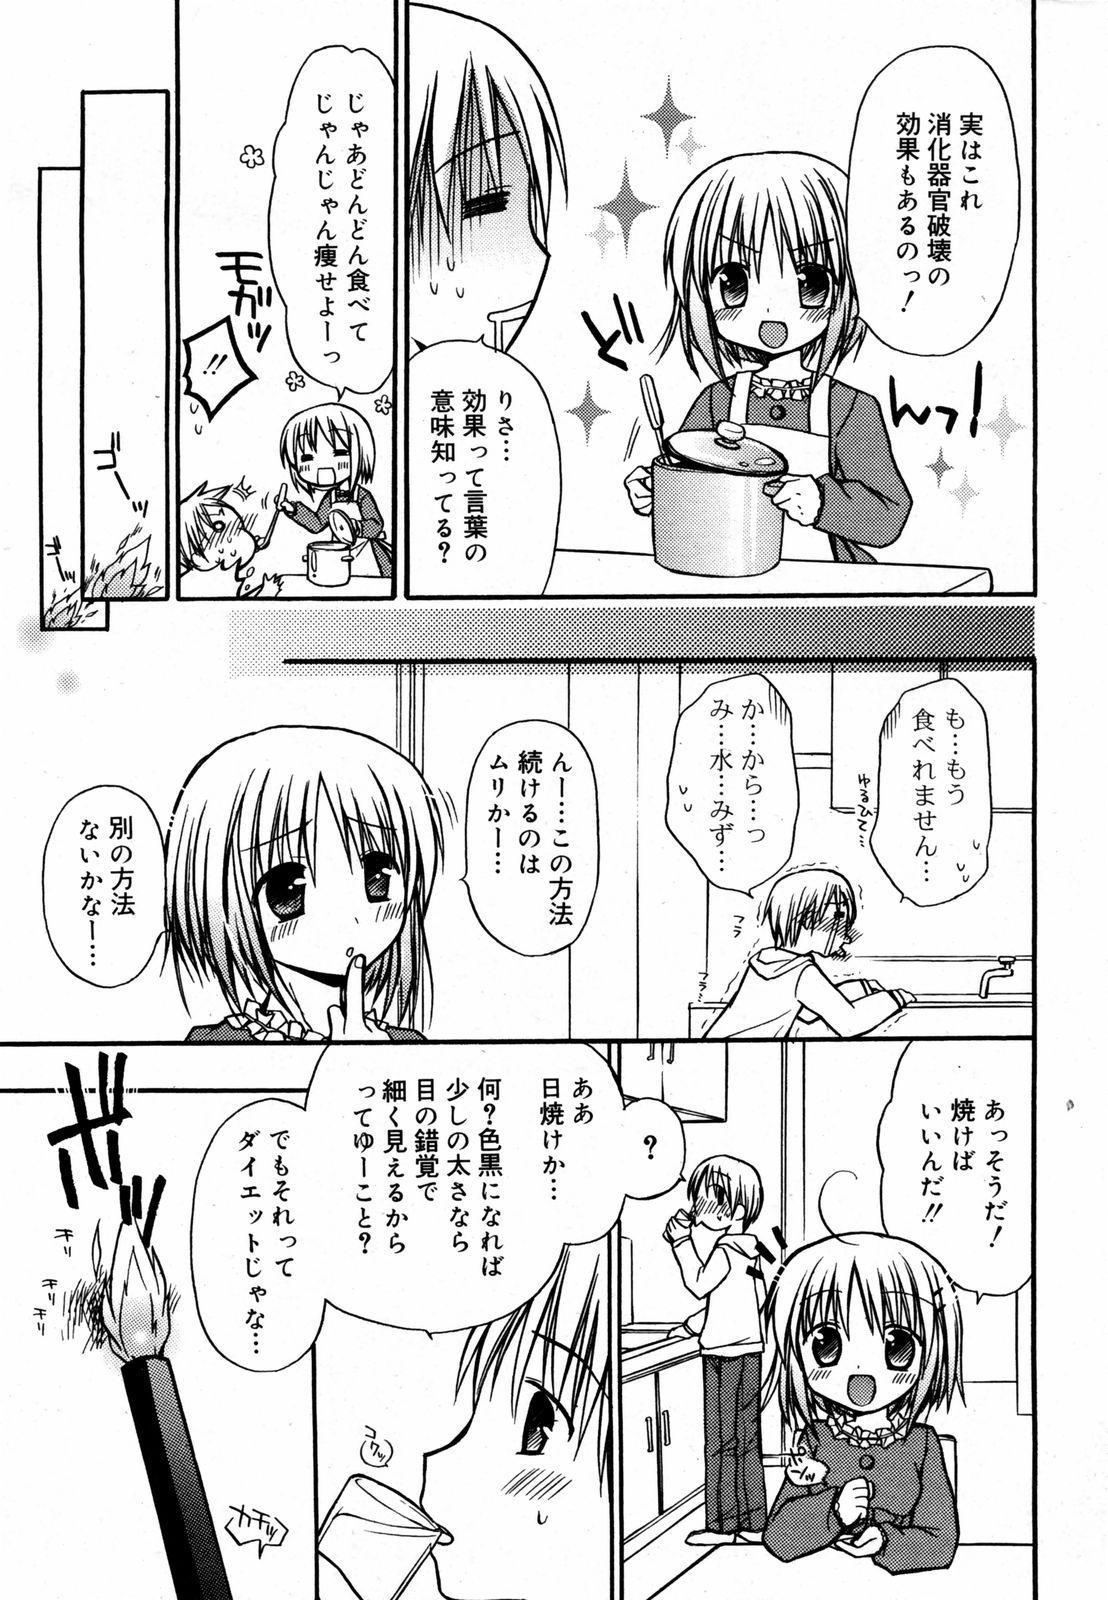 Manga Bangaichi 2008-03 26